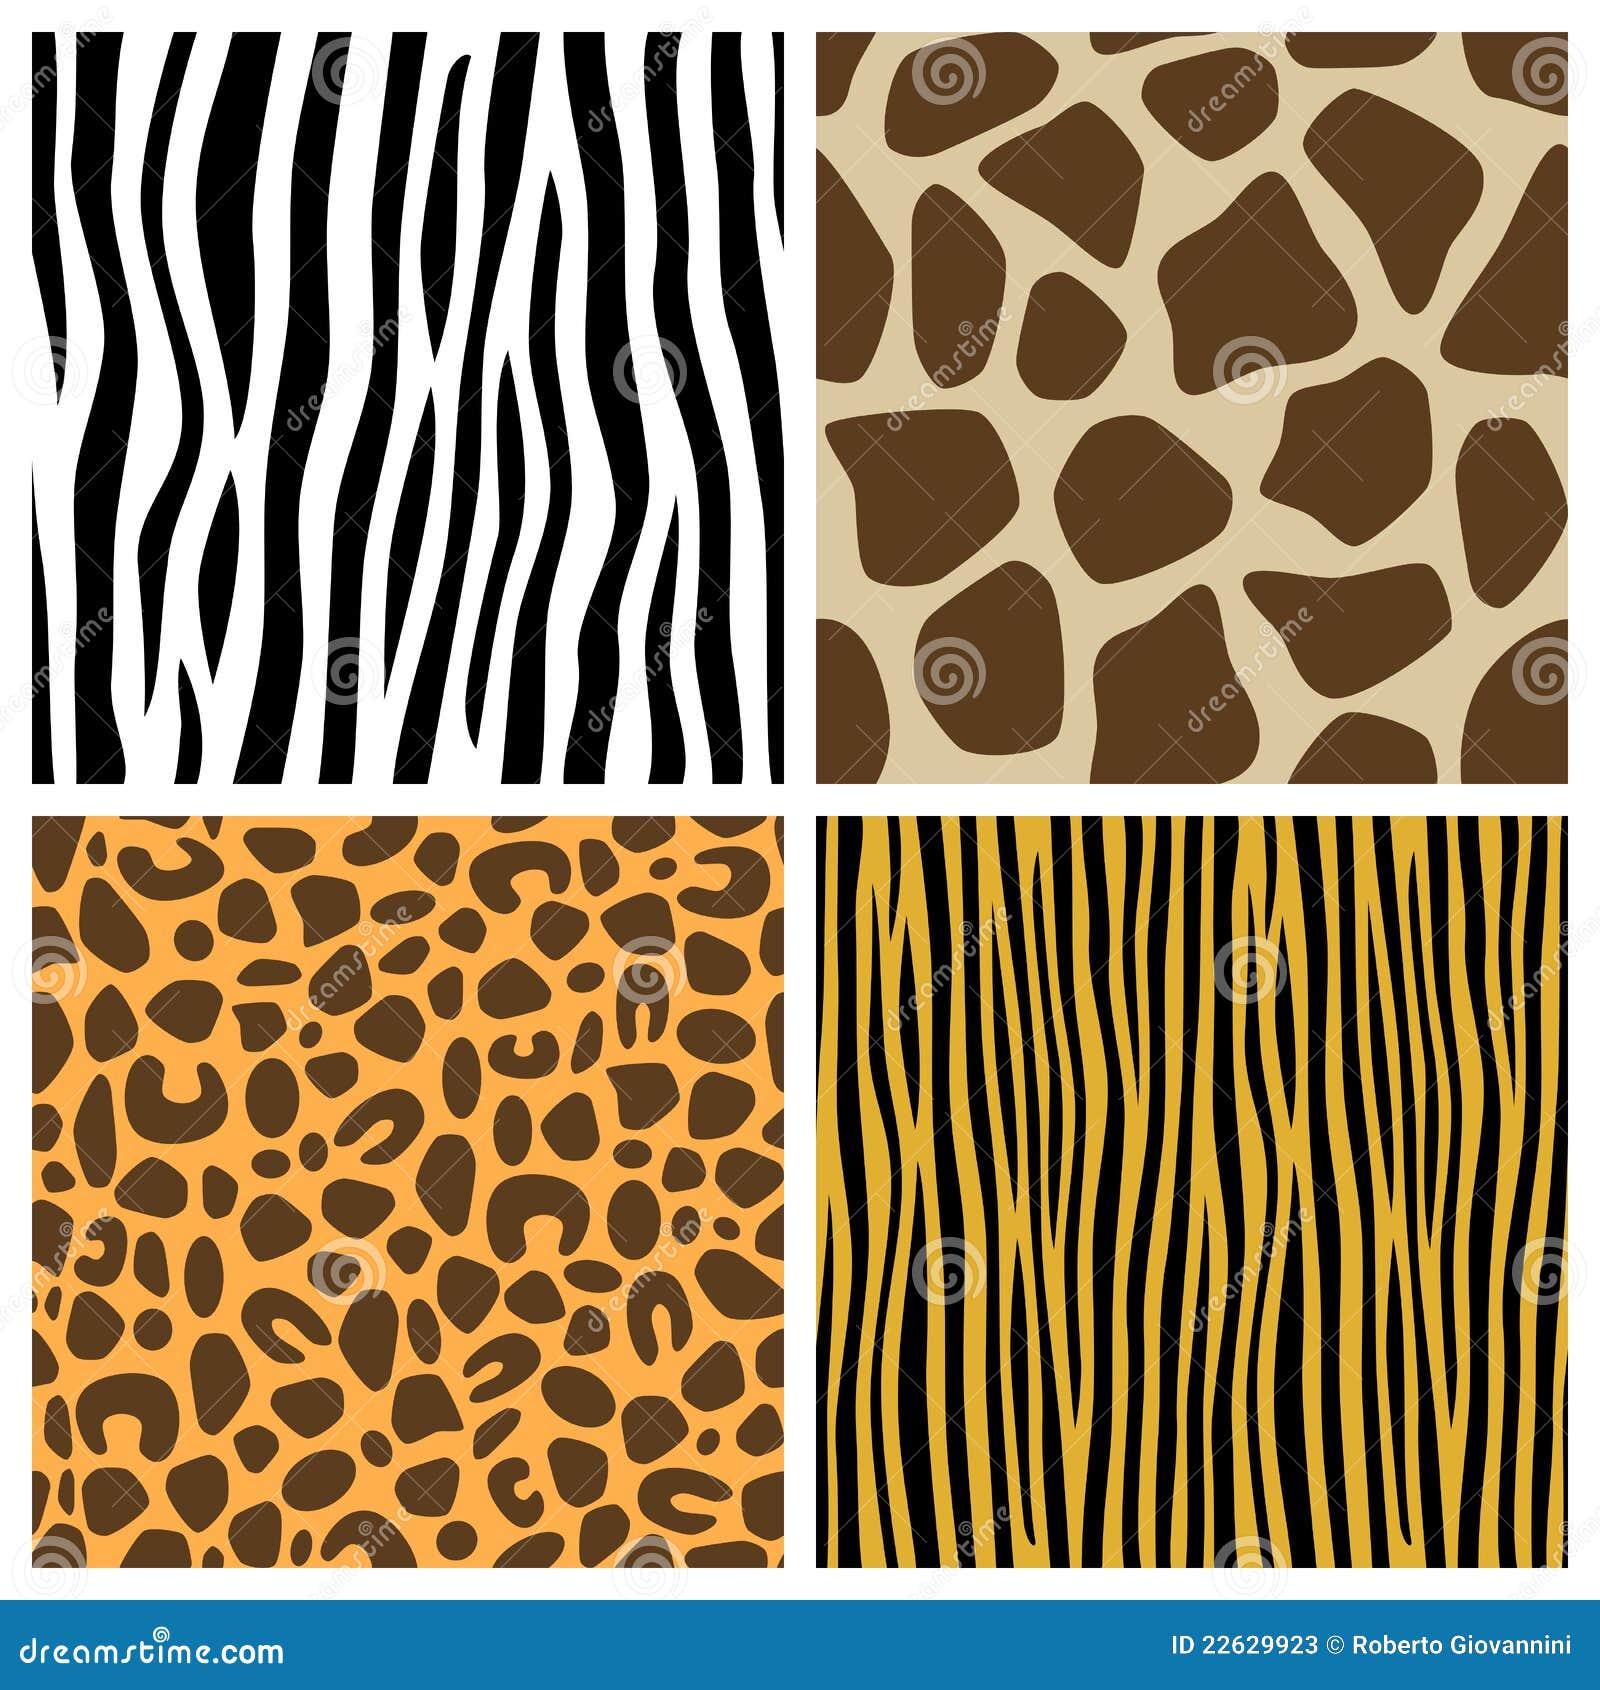 Download Animal Fur Seamless Patterns Stock Vector - Illustration of giraffe, camouflage: 22629923